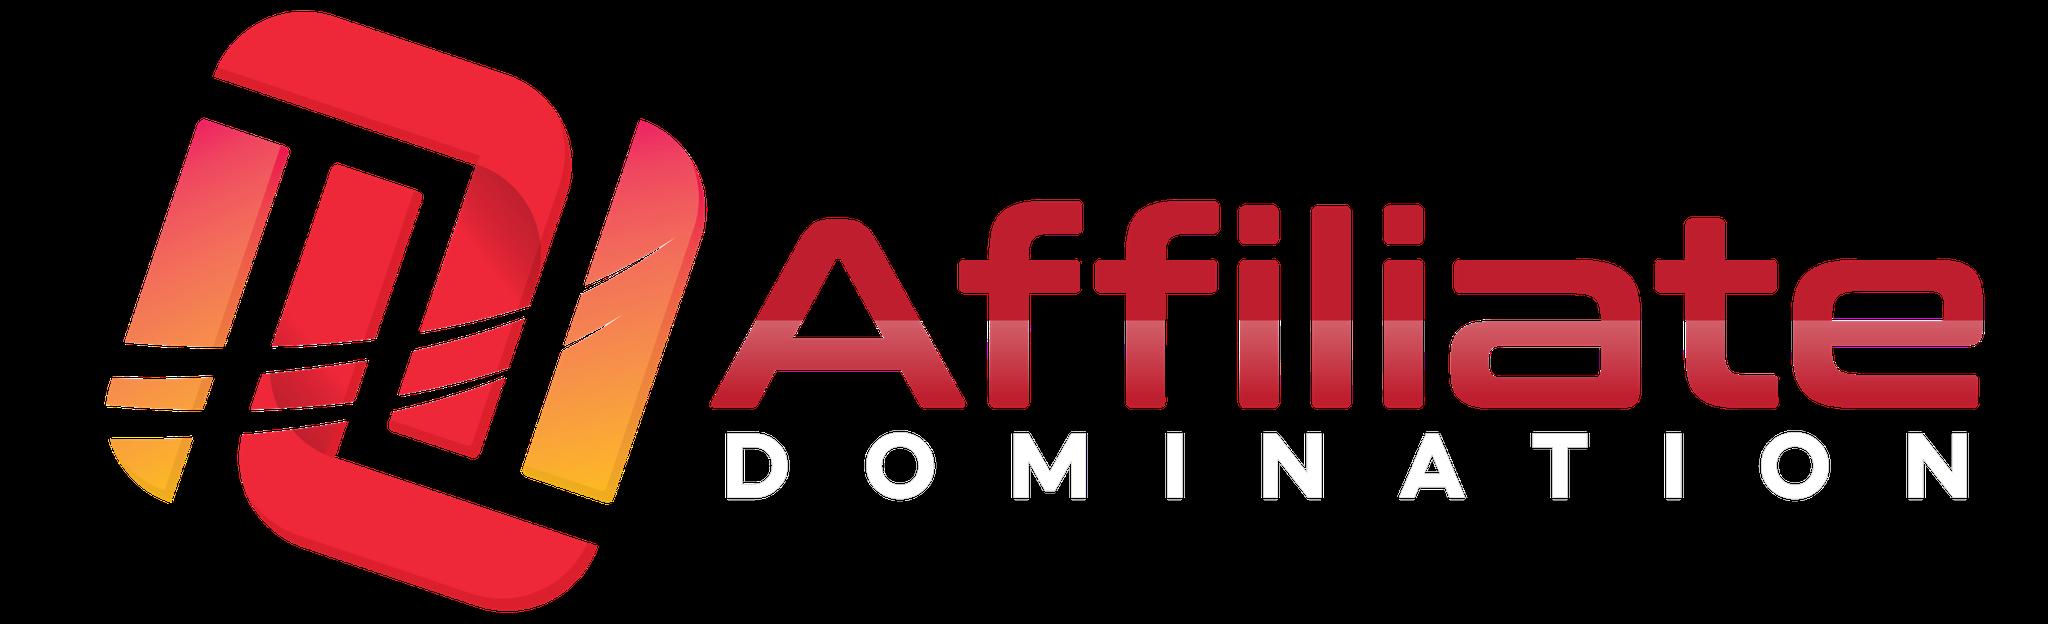 Affiliate domination logo